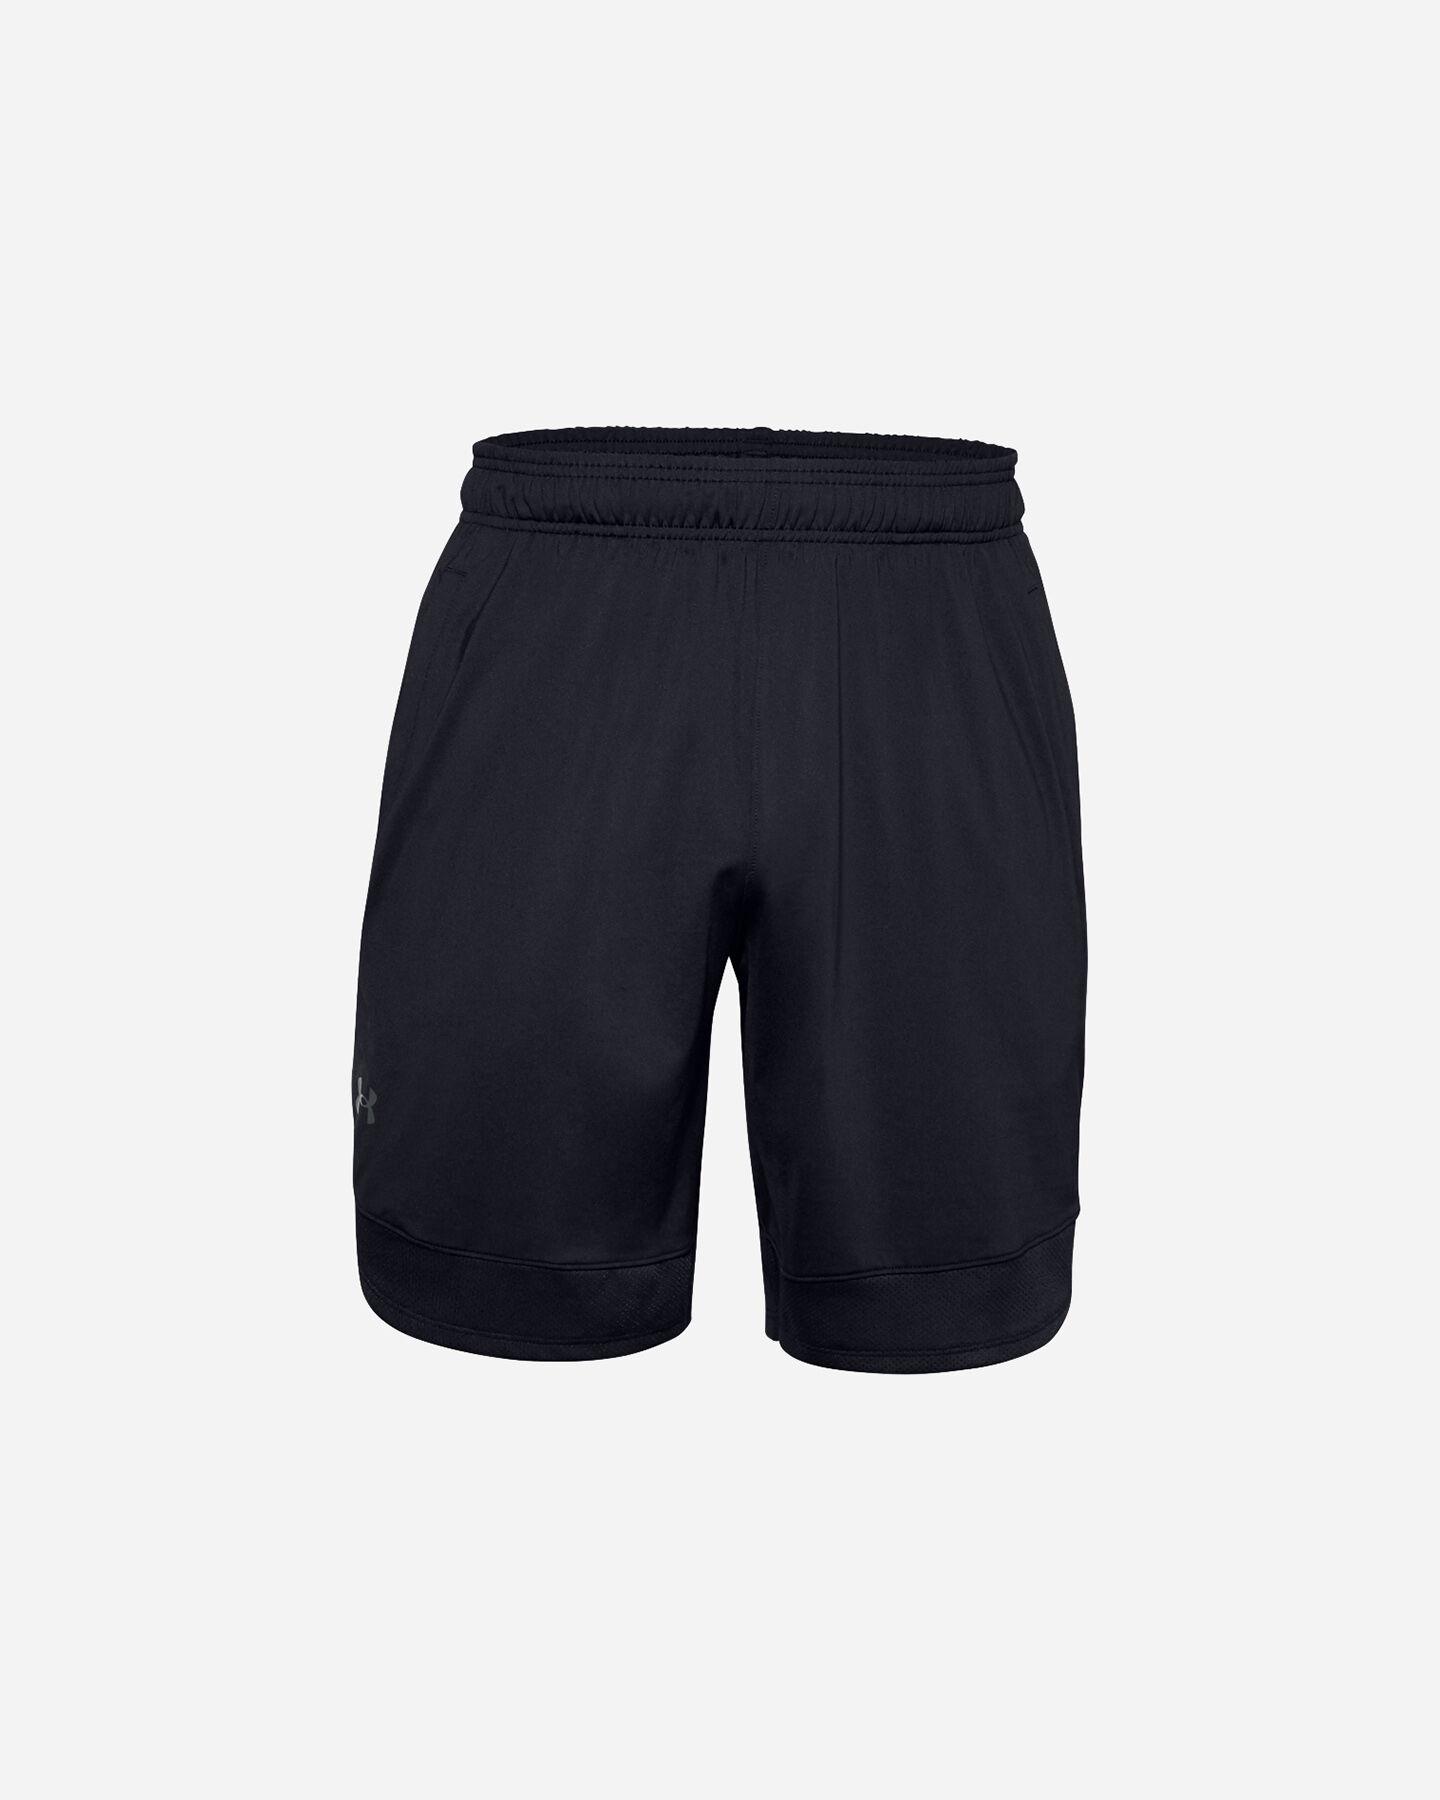 Pantalone training UNDER ARMOUR TRAIN STRETCH M S5229411 scatto 1